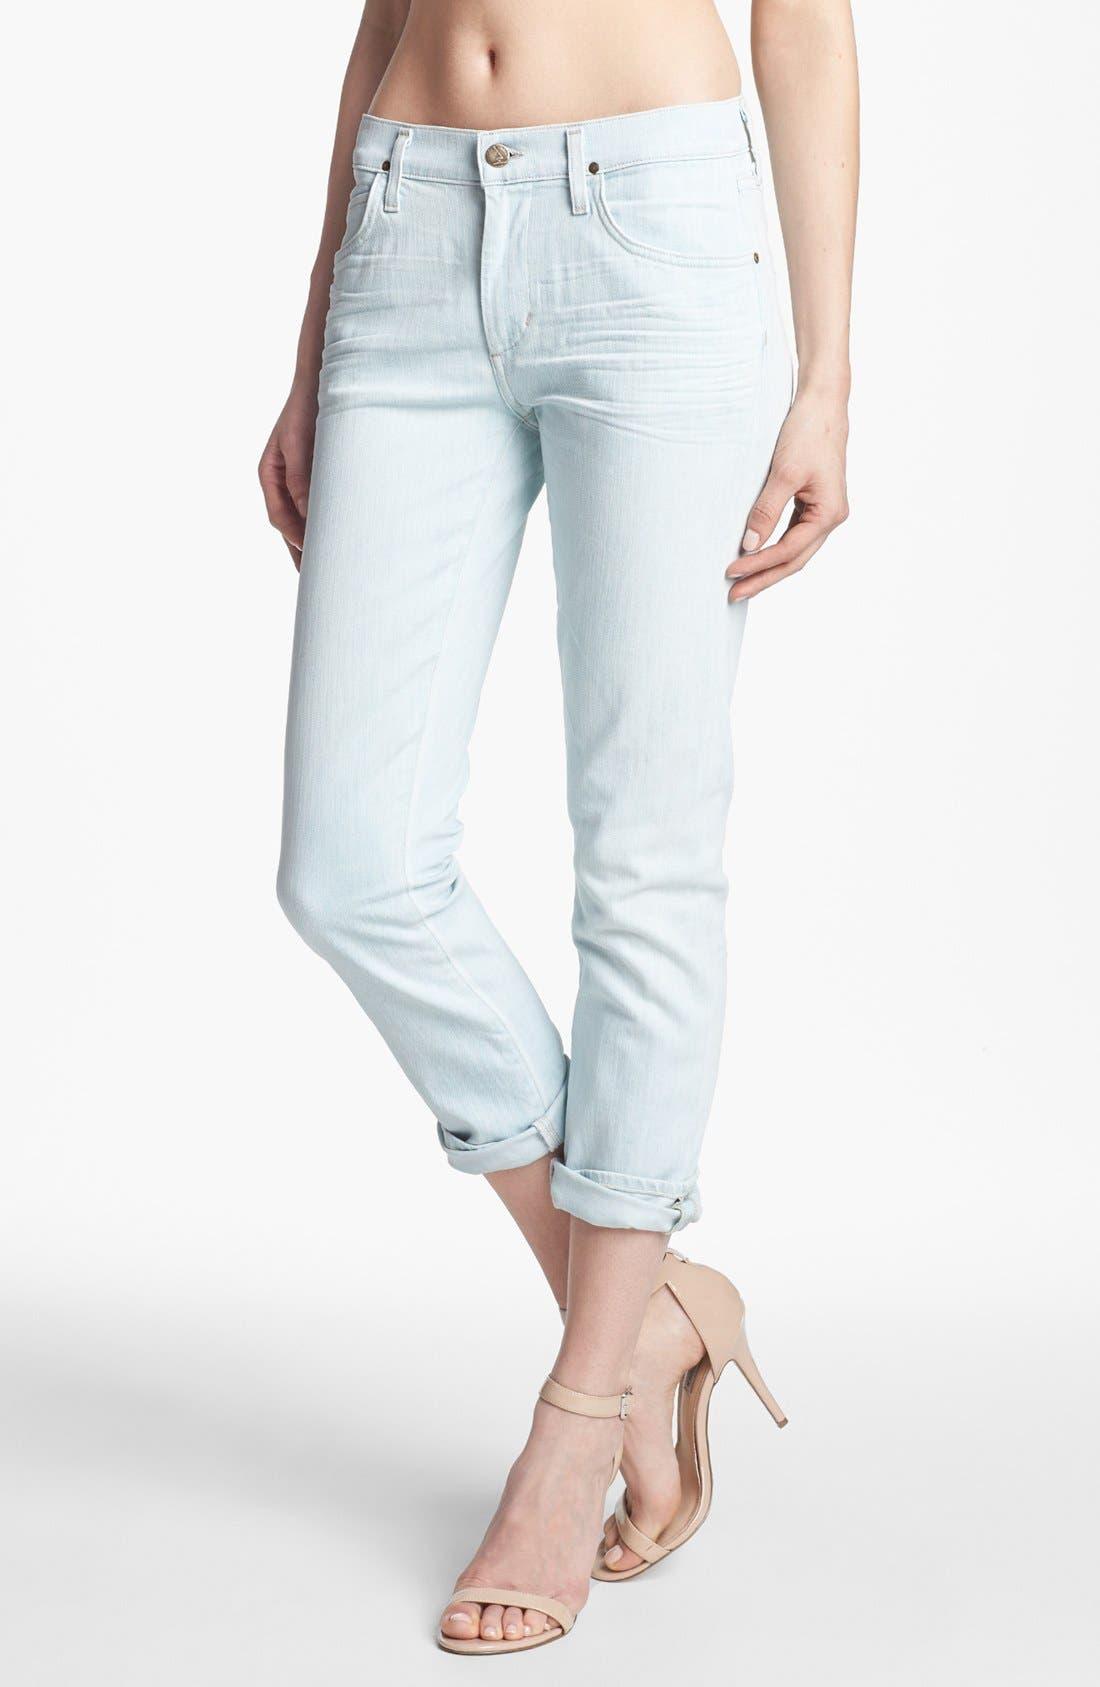 Alternate Image 1 Selected - Citizens of Humanity 'Carlton' Skinny Crop Jeans (Serene)